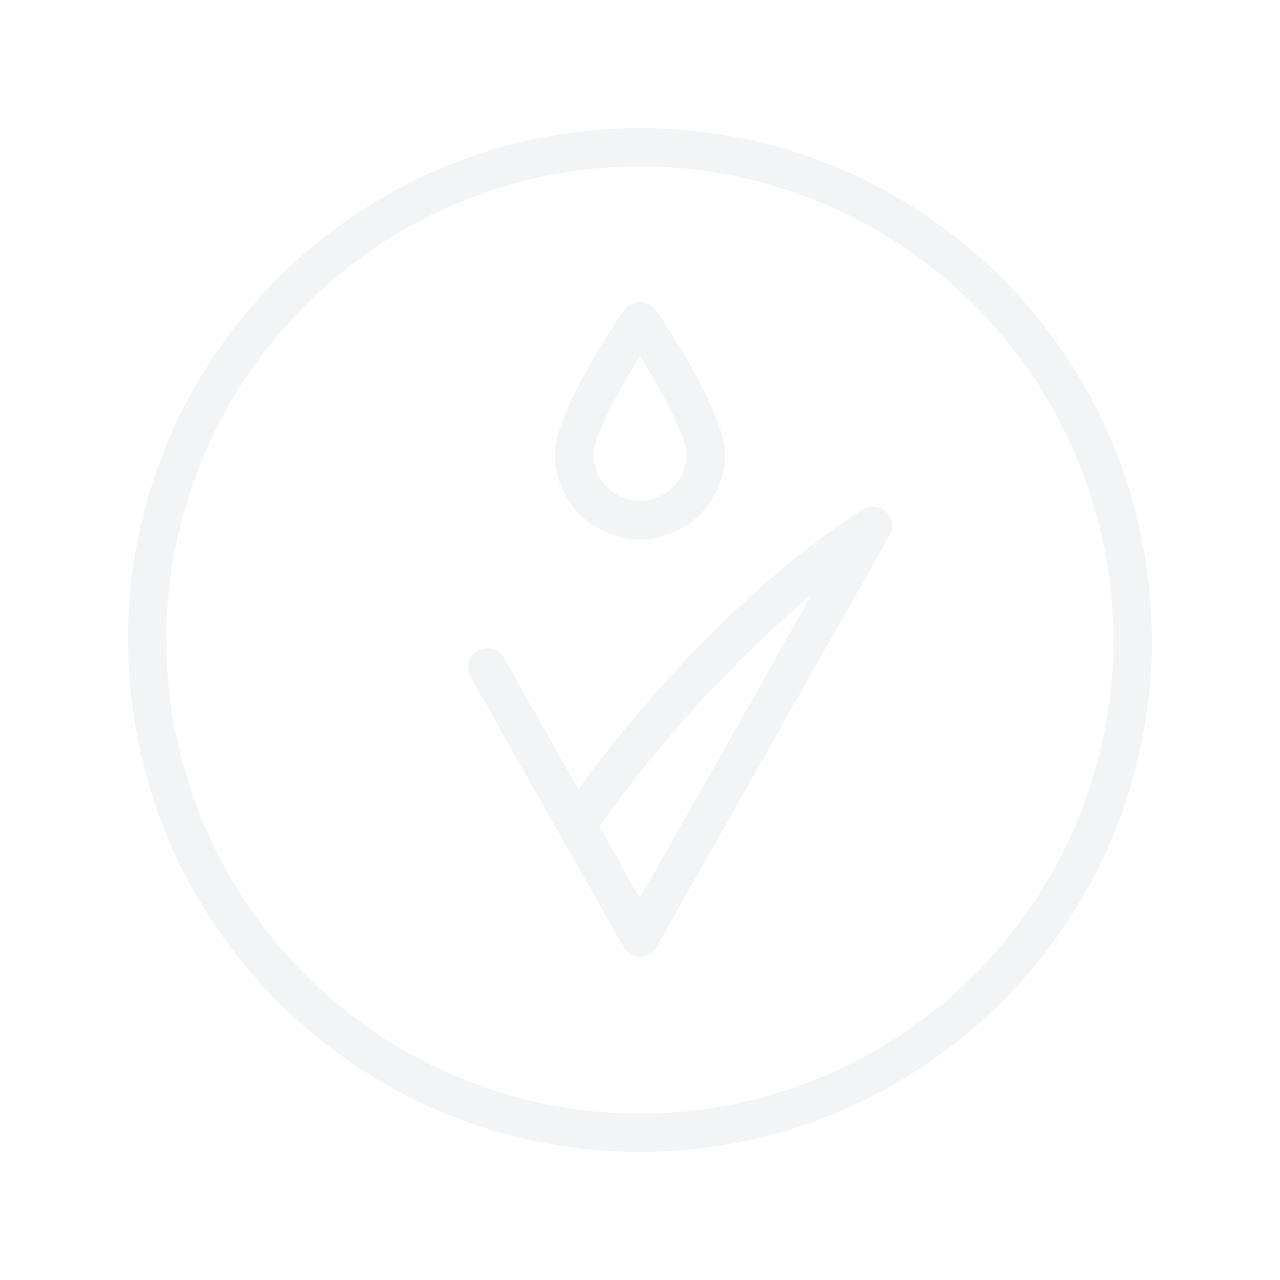 ESTEE LAUDER Resilience Lift Eye Cream 15ml